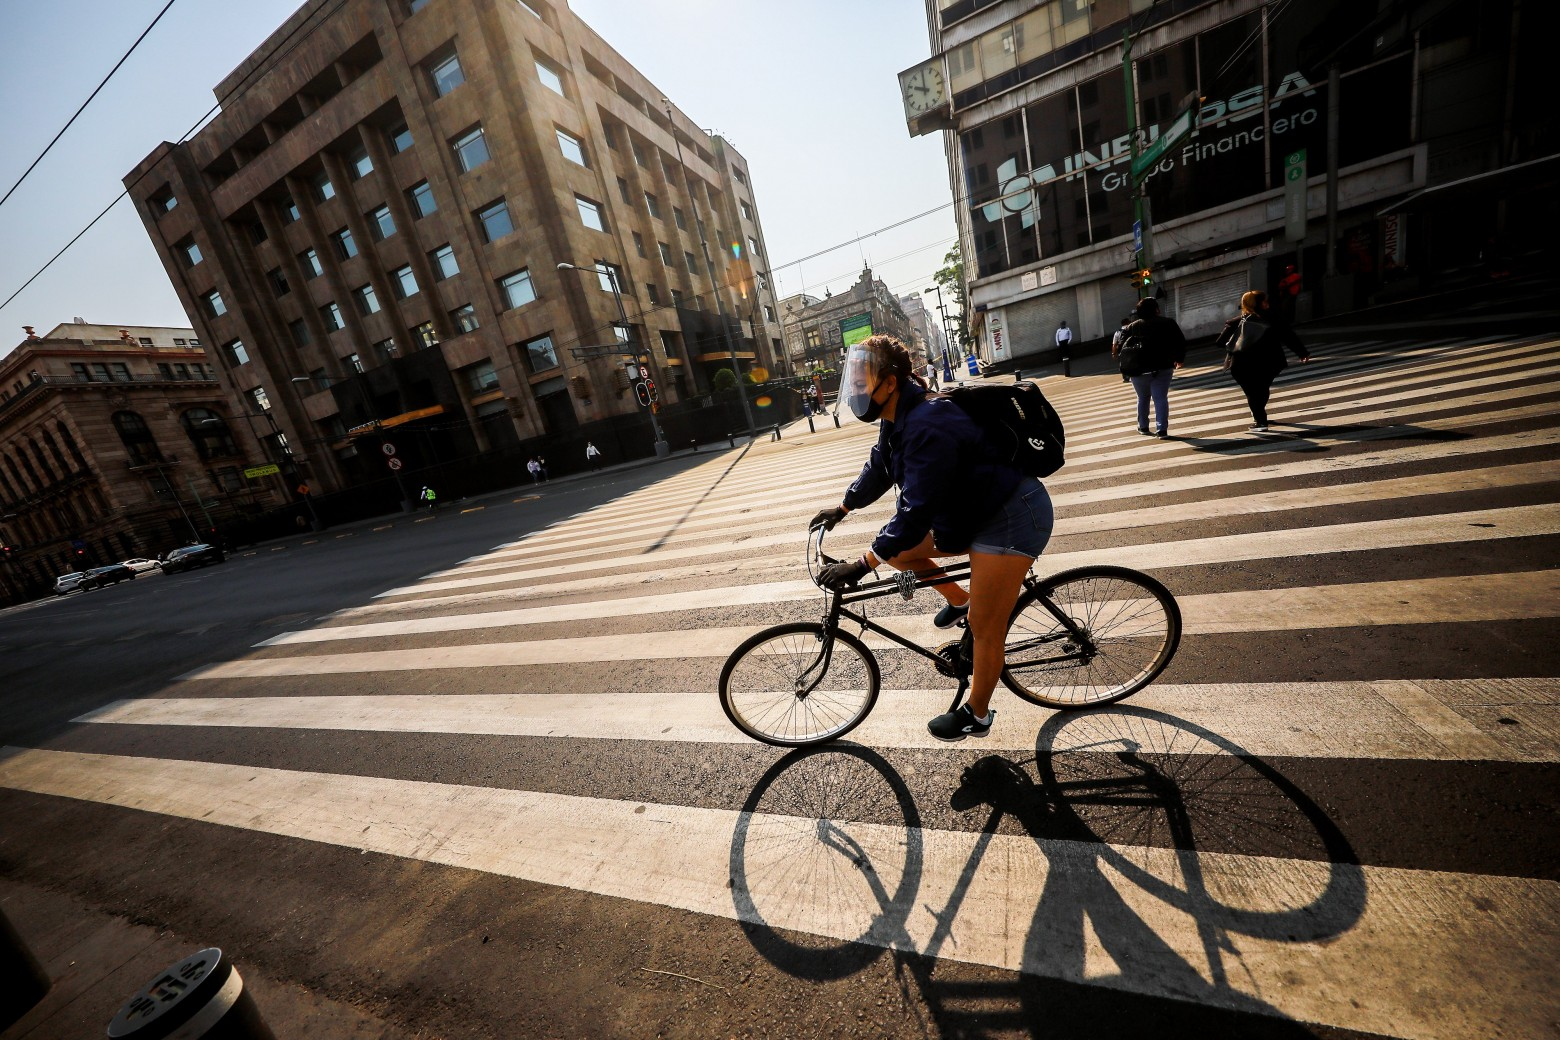 pandemia-nuevos-ciclistas-urbanos/